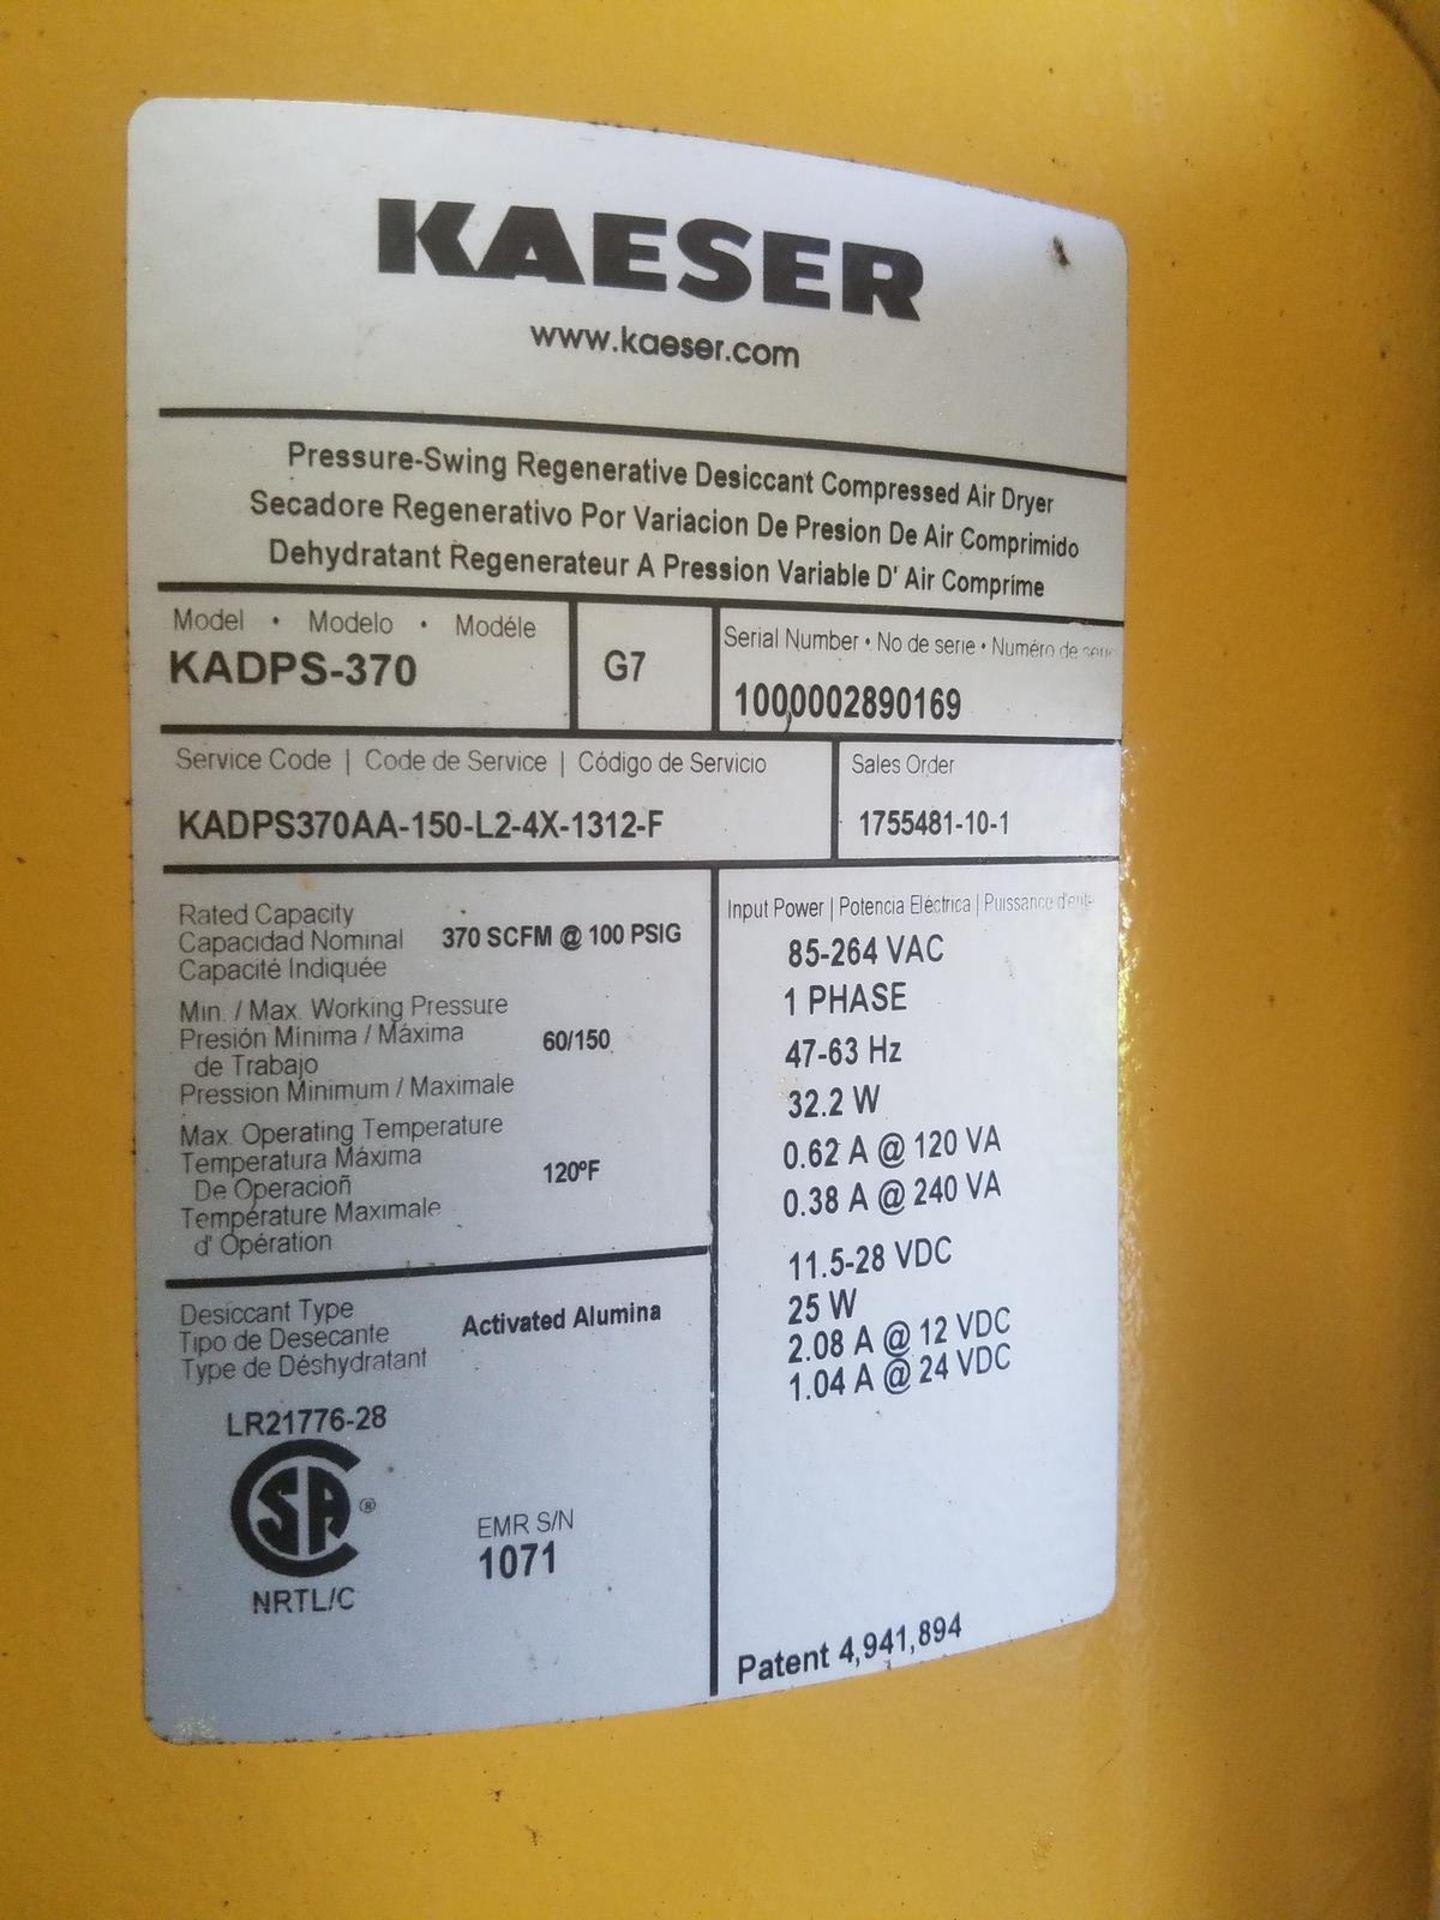 Kaeser Compressed Air Dryer, M# KADPS-370, 370 SCFM at 100 PSIG, 120F Max Operat | Rig Fee: $250 - Image 2 of 3